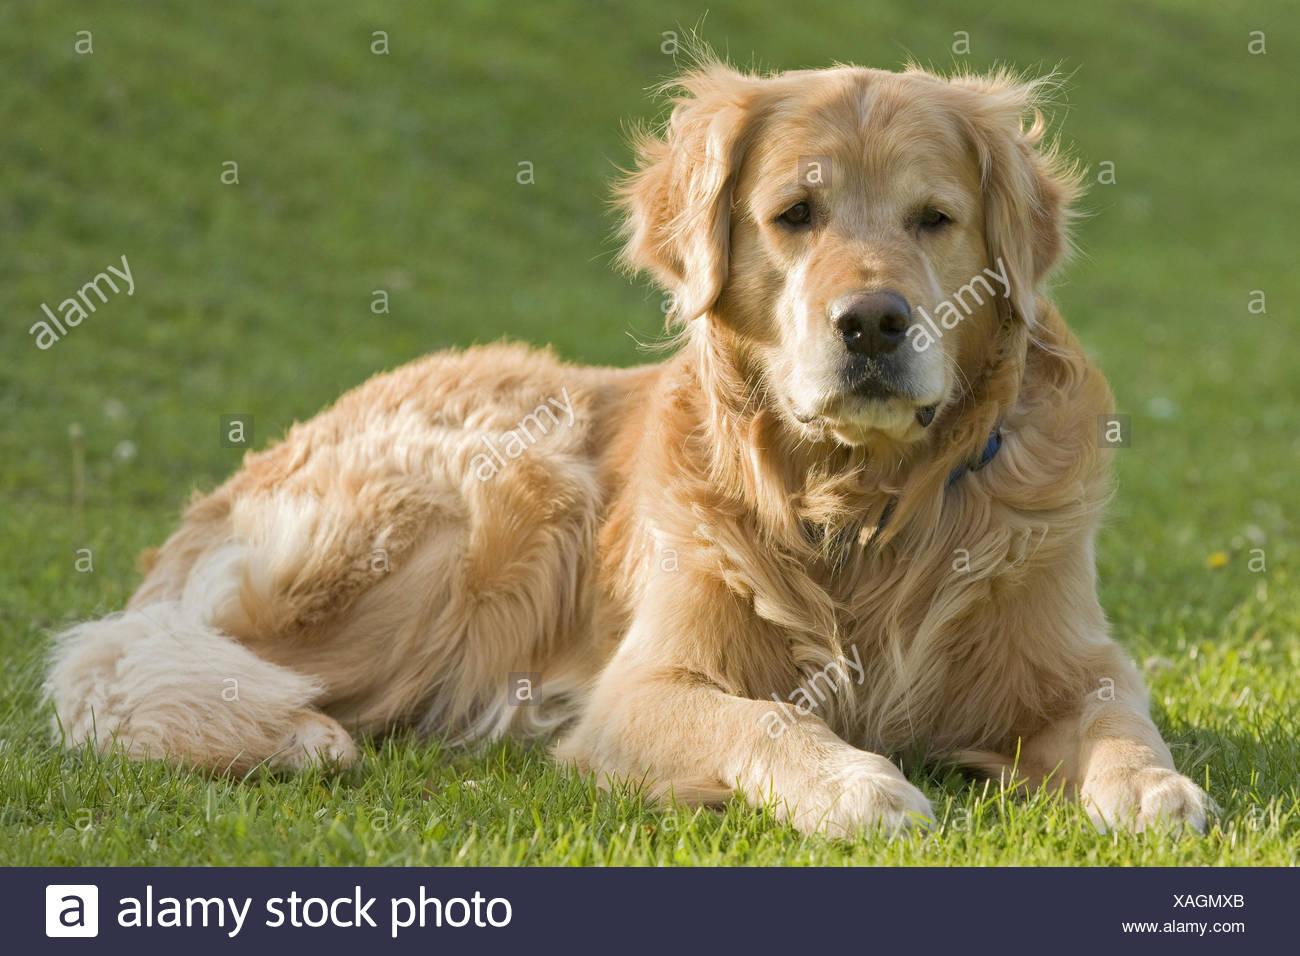 Dog, Golden retrievers, meadow, lie, - Stock Image